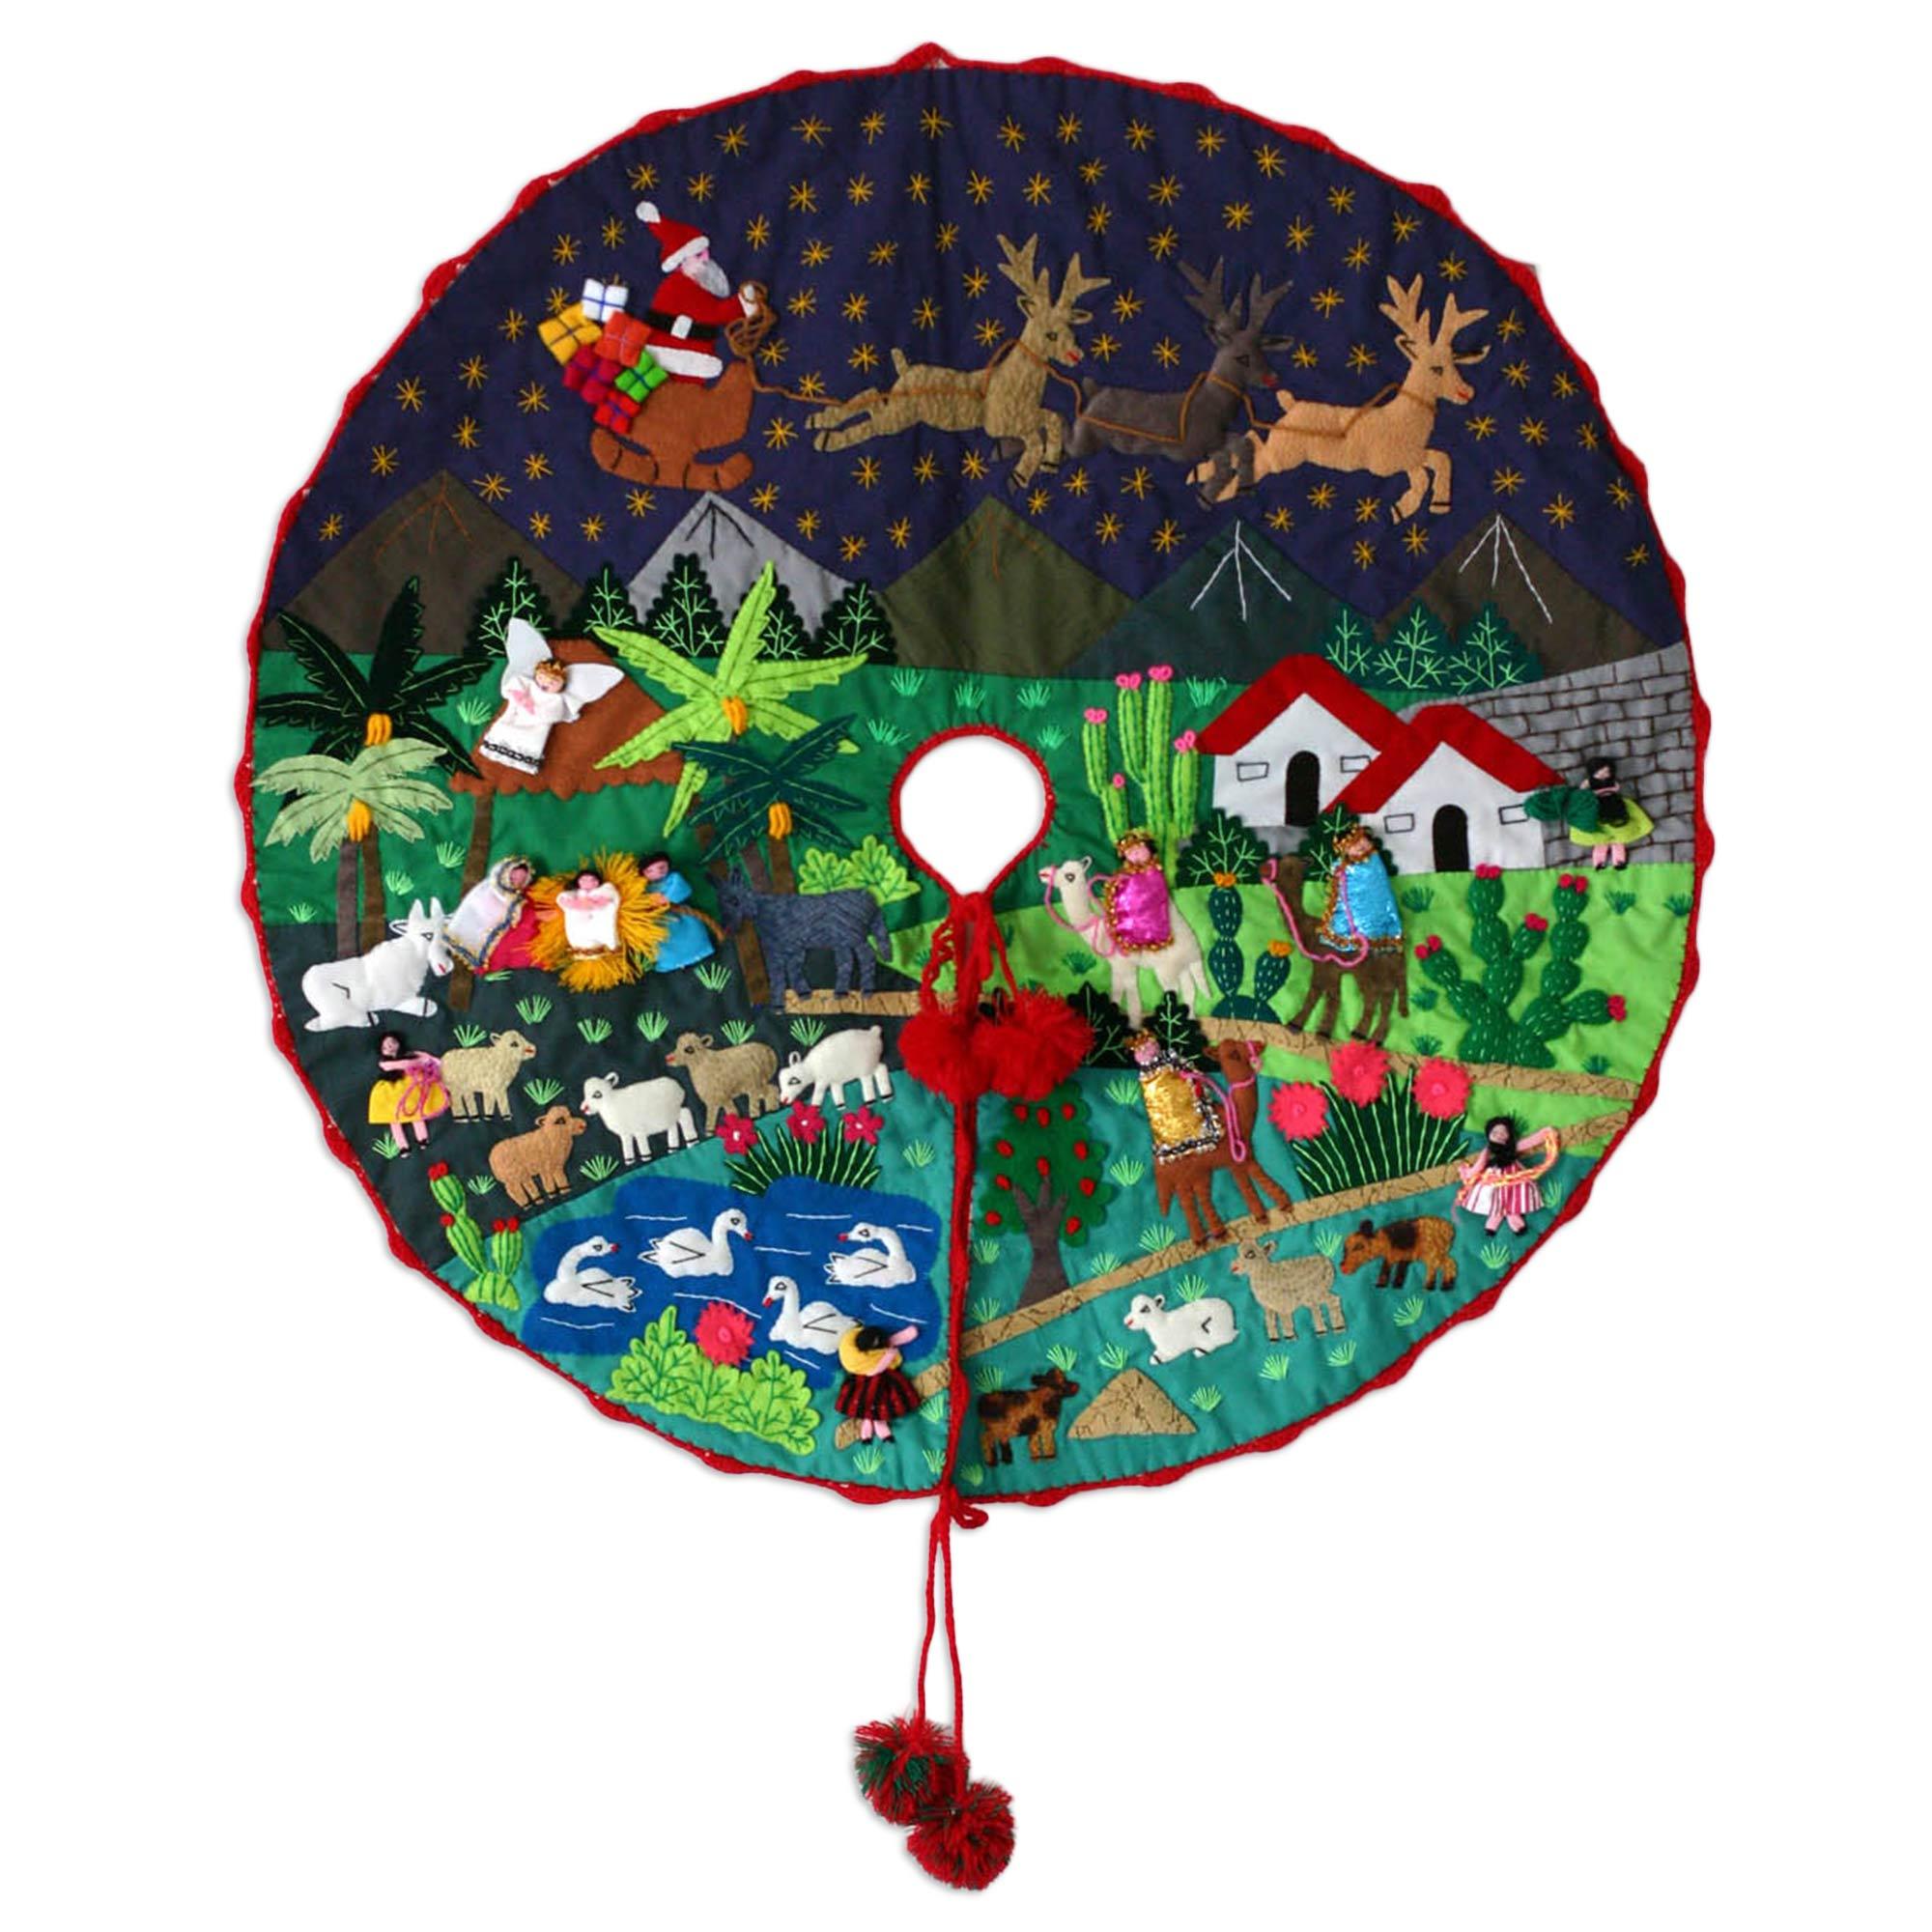 Nativity Scene Peruvian Folk Art Cotton Christmas Scene Tree Skirt Unique Holiday Decor Treasures